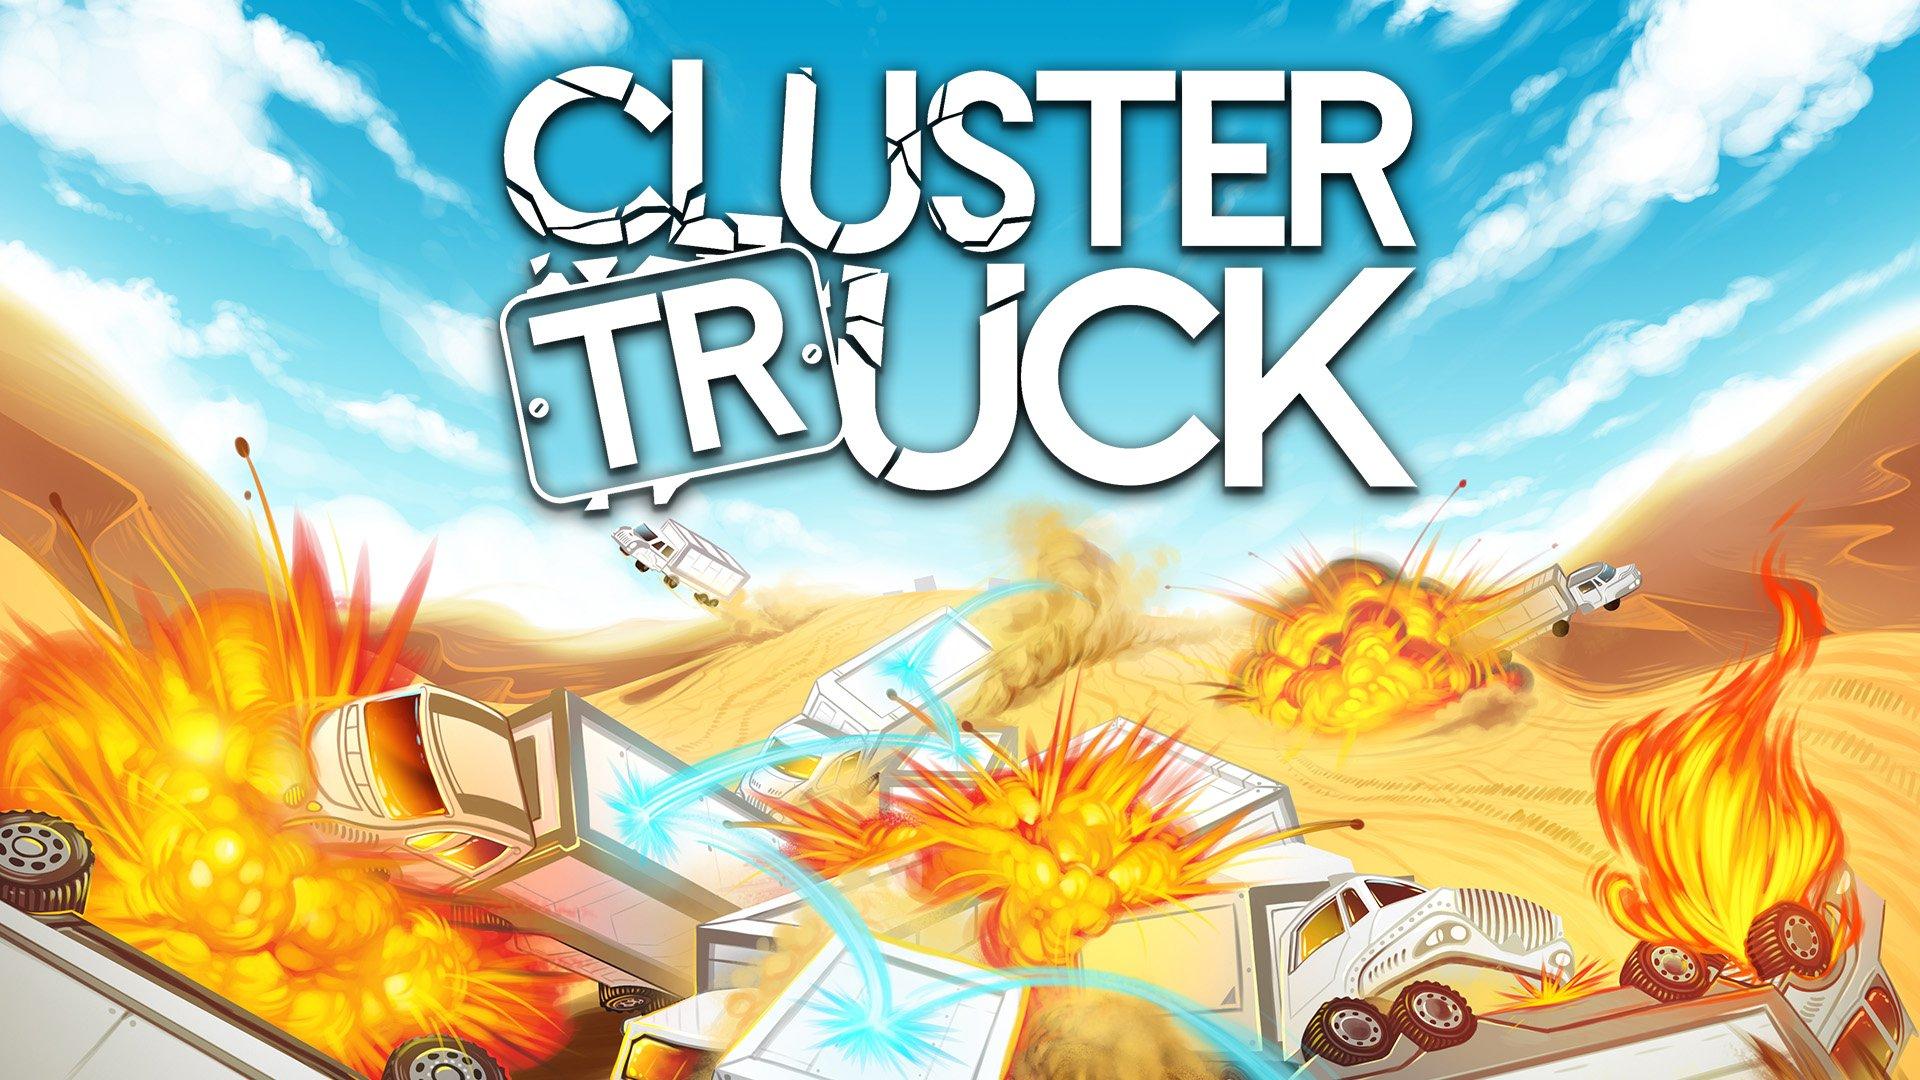 clustertruck free download  gametrex